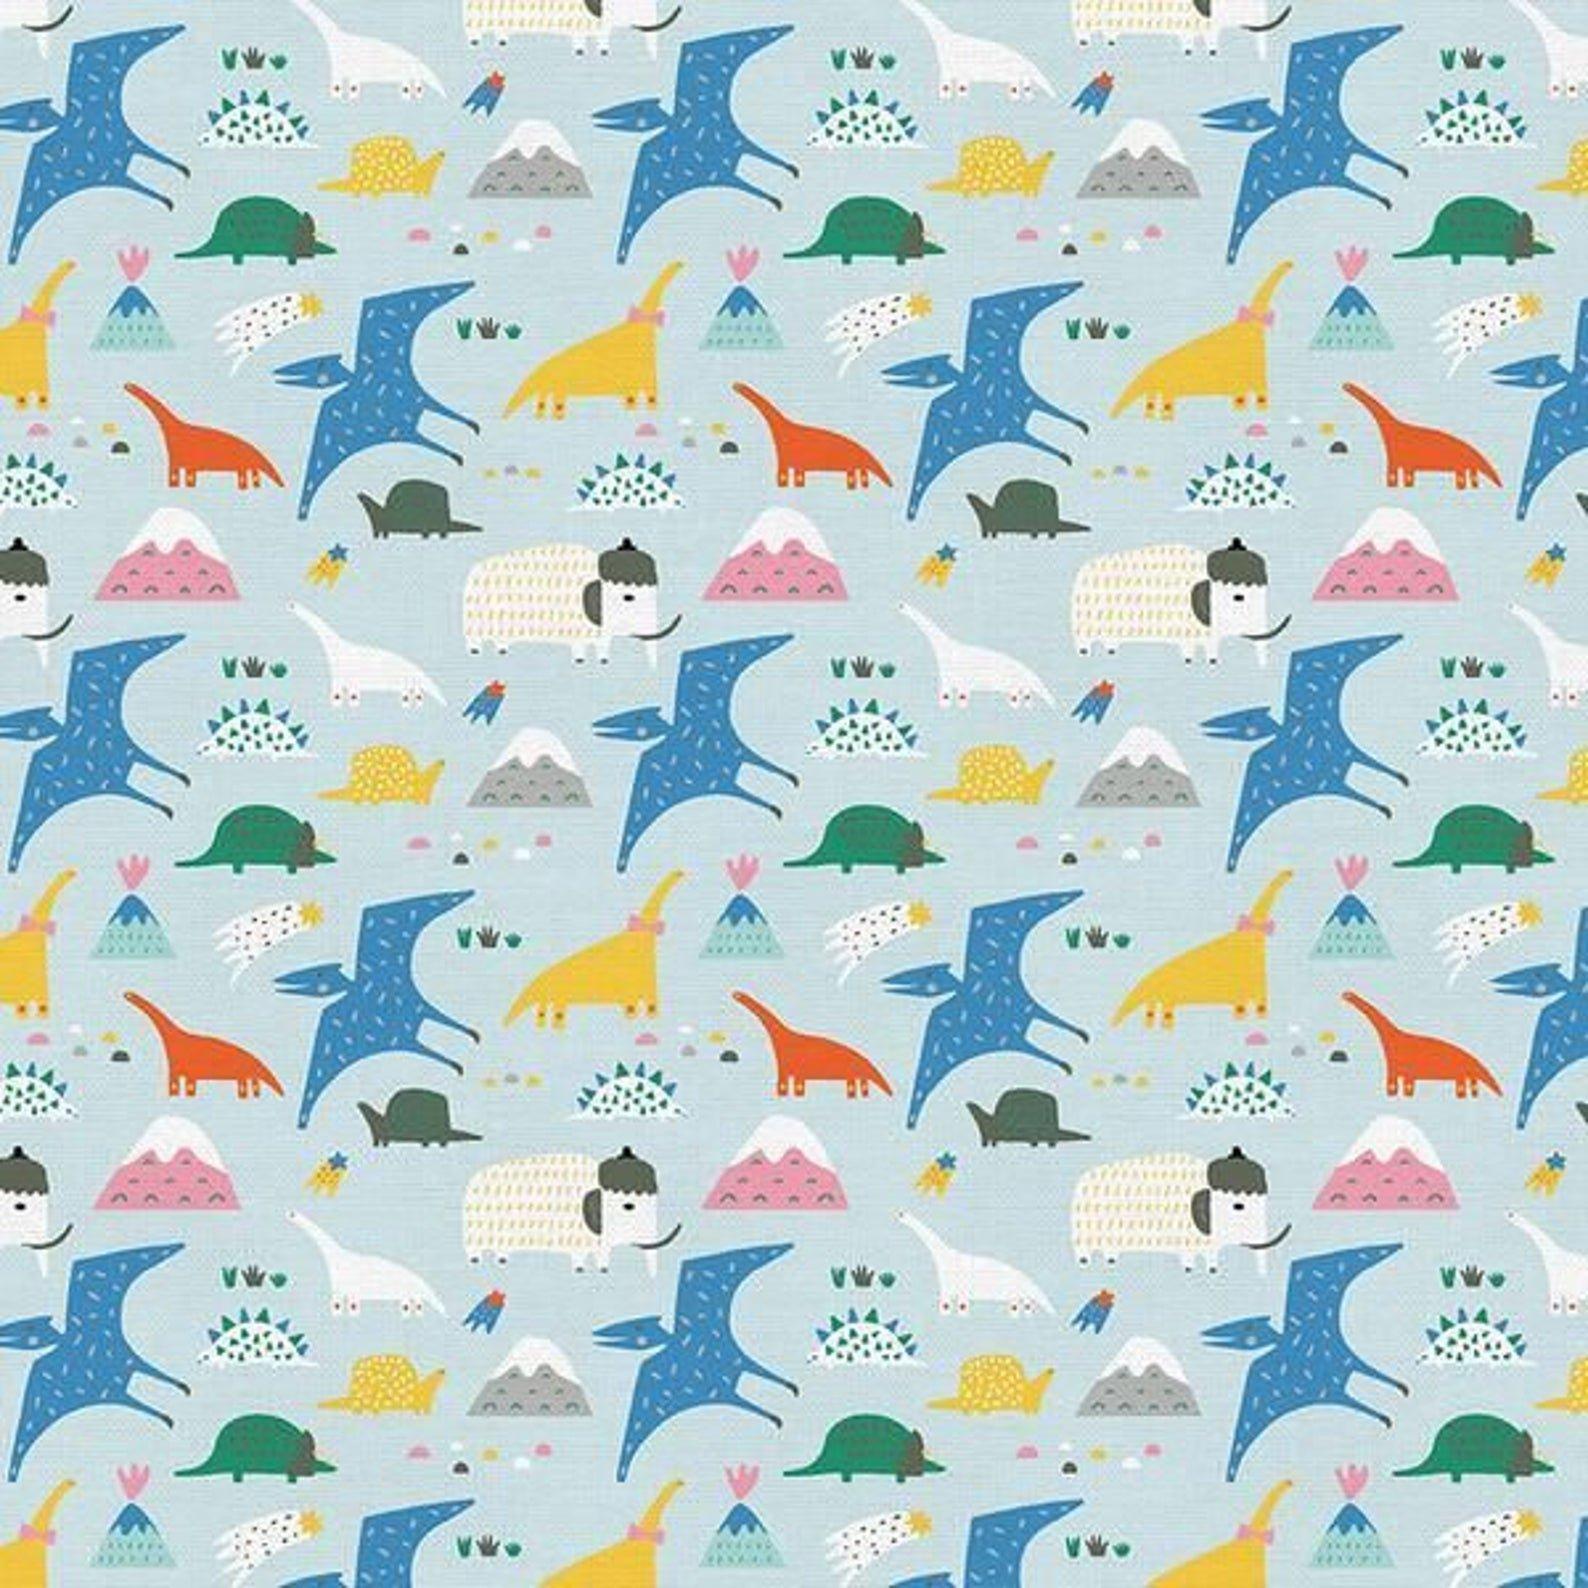 Animal Alphabet Dinosaurs Blue Fabric by Paintbrush Studios